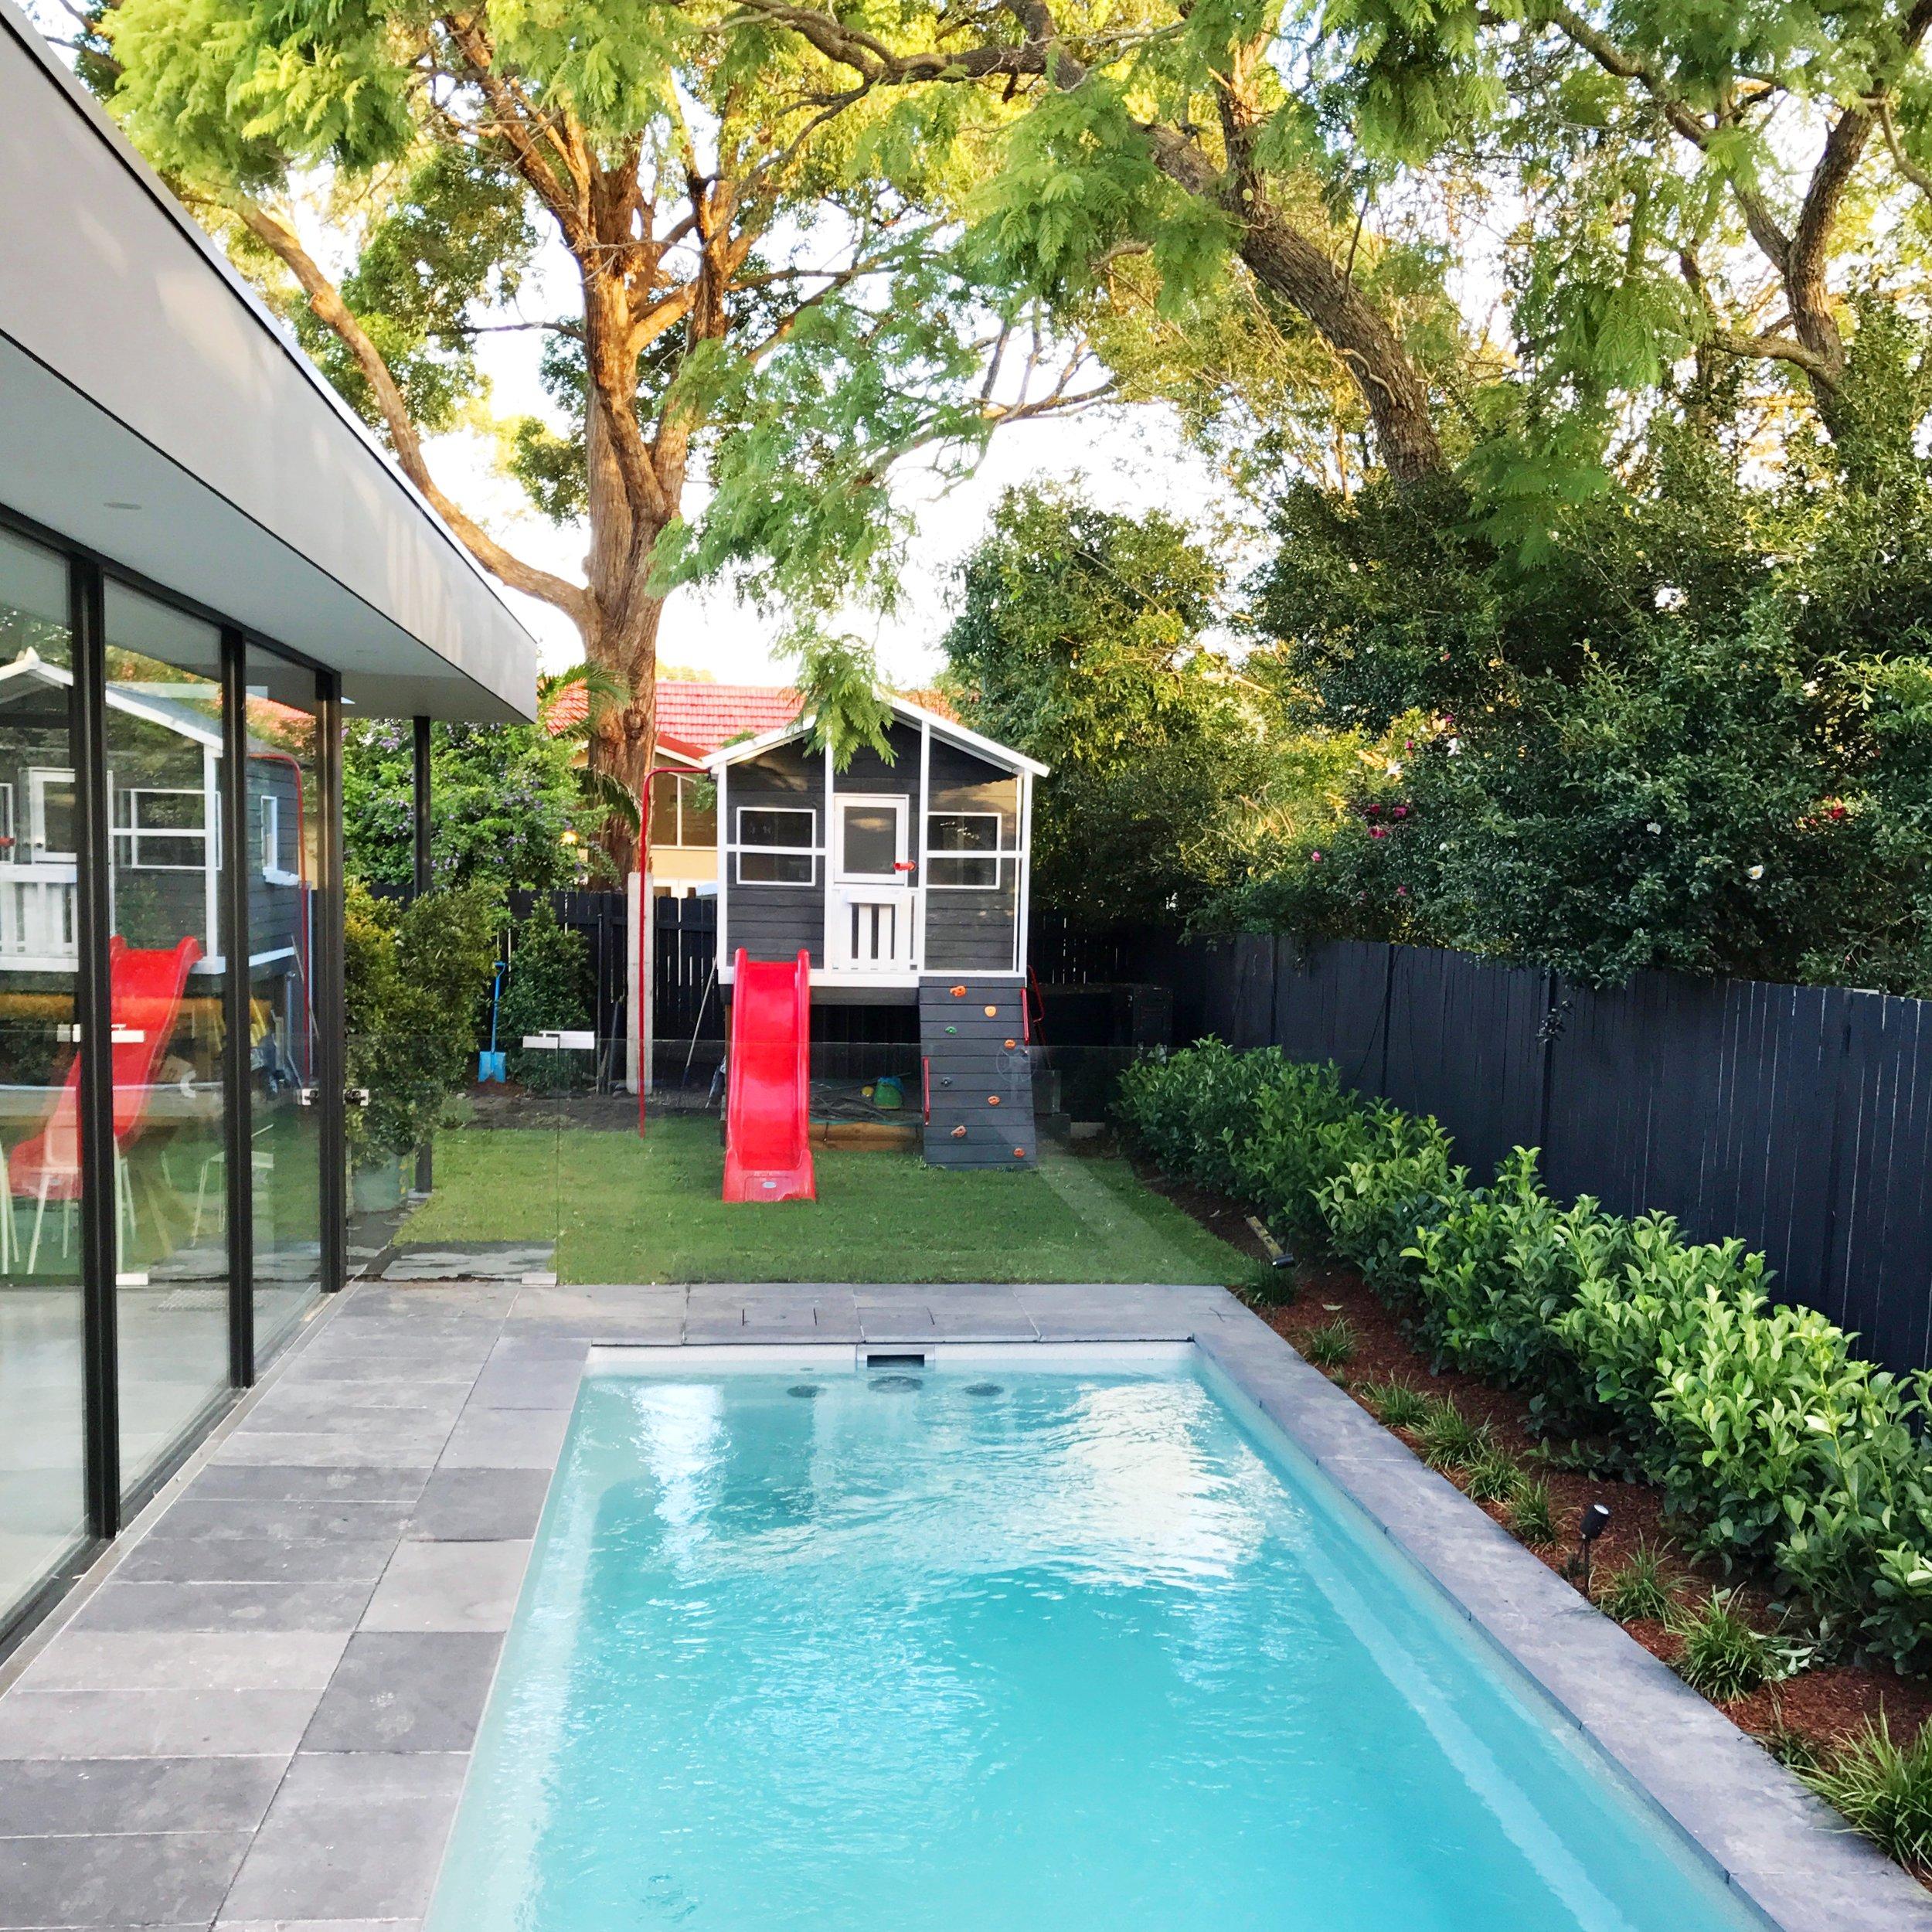 Back garden - Pool and Cubby House.JPG